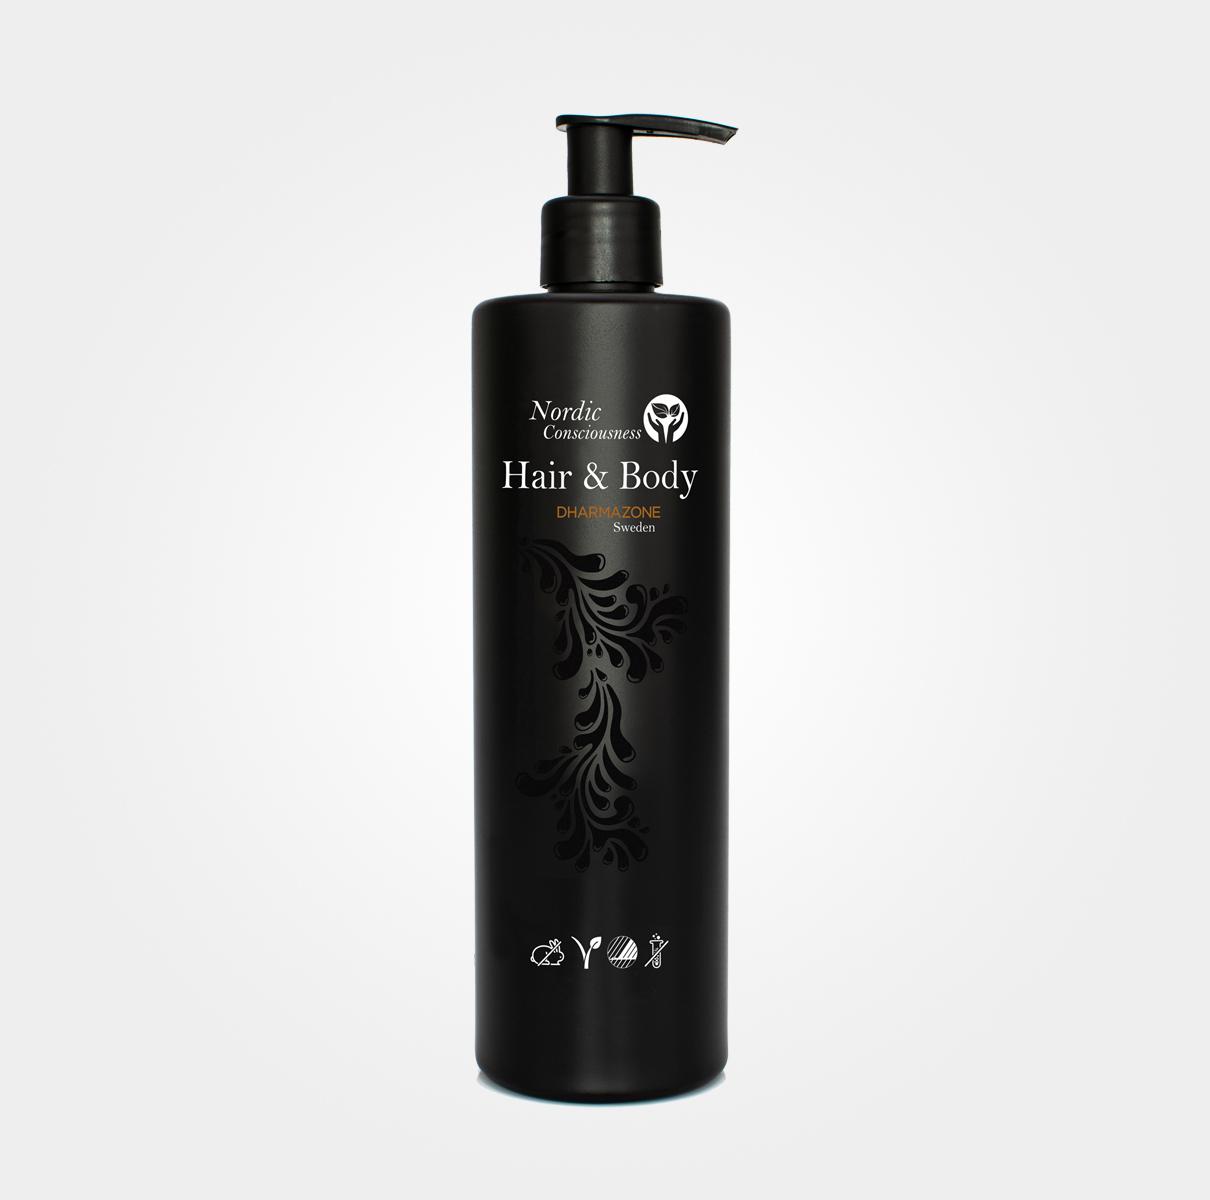 Nordic Consciousness Hair & Body Wash 400 ml